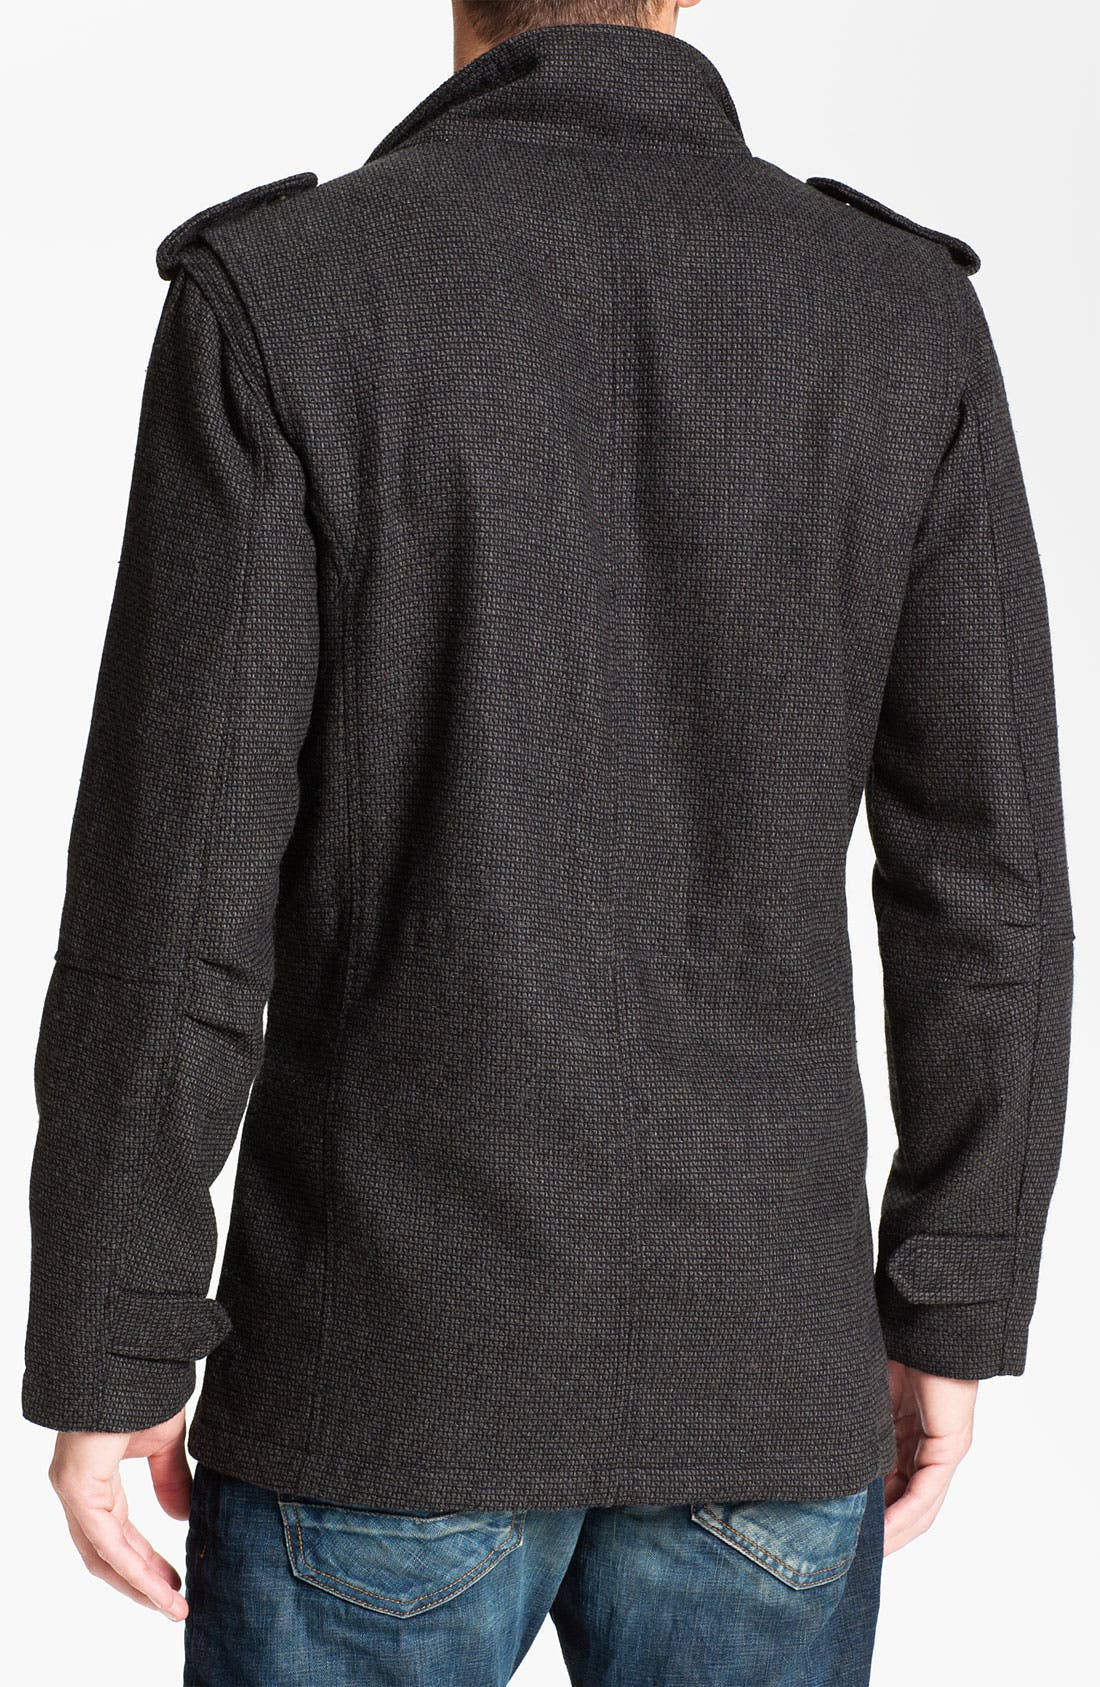 Alternate Image 2  - Ezekiel 'Predator' Tweed Jacket